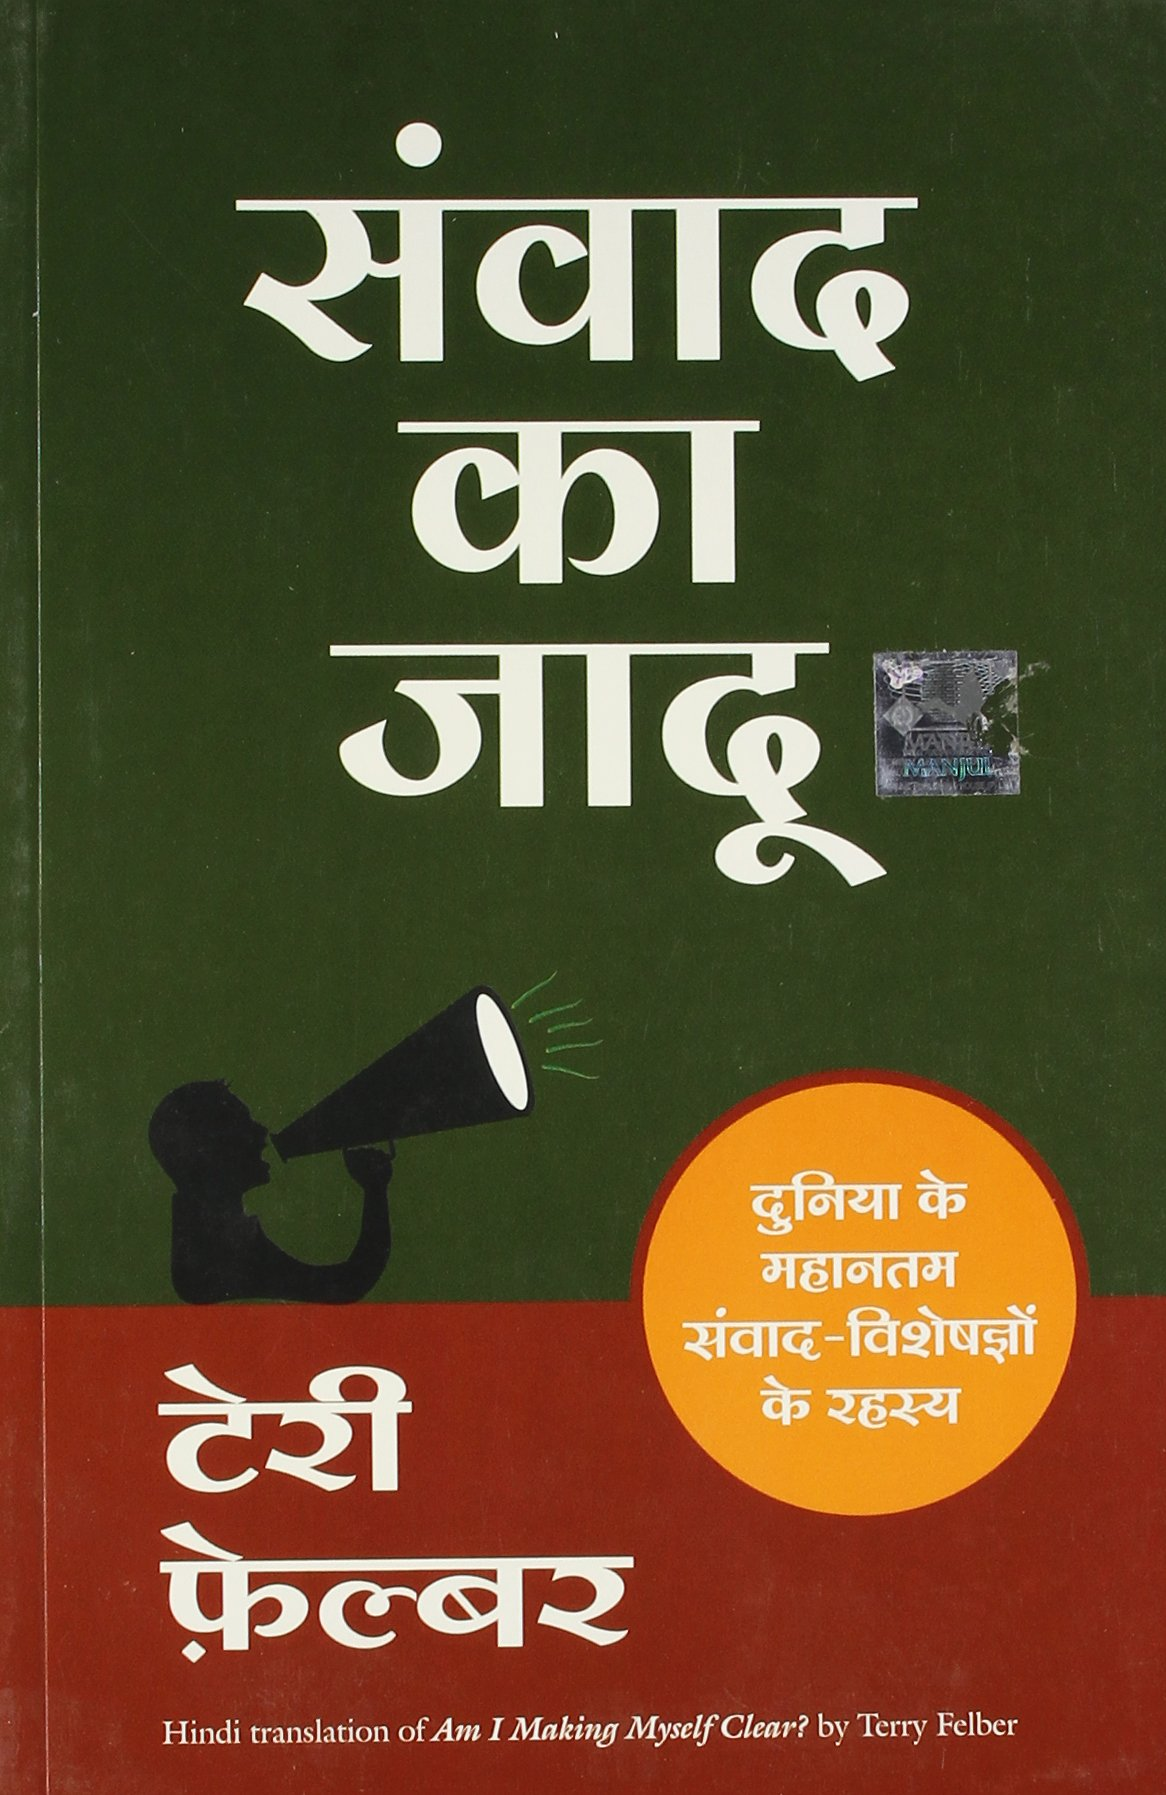 Dale Carnegie Pdf Hindi